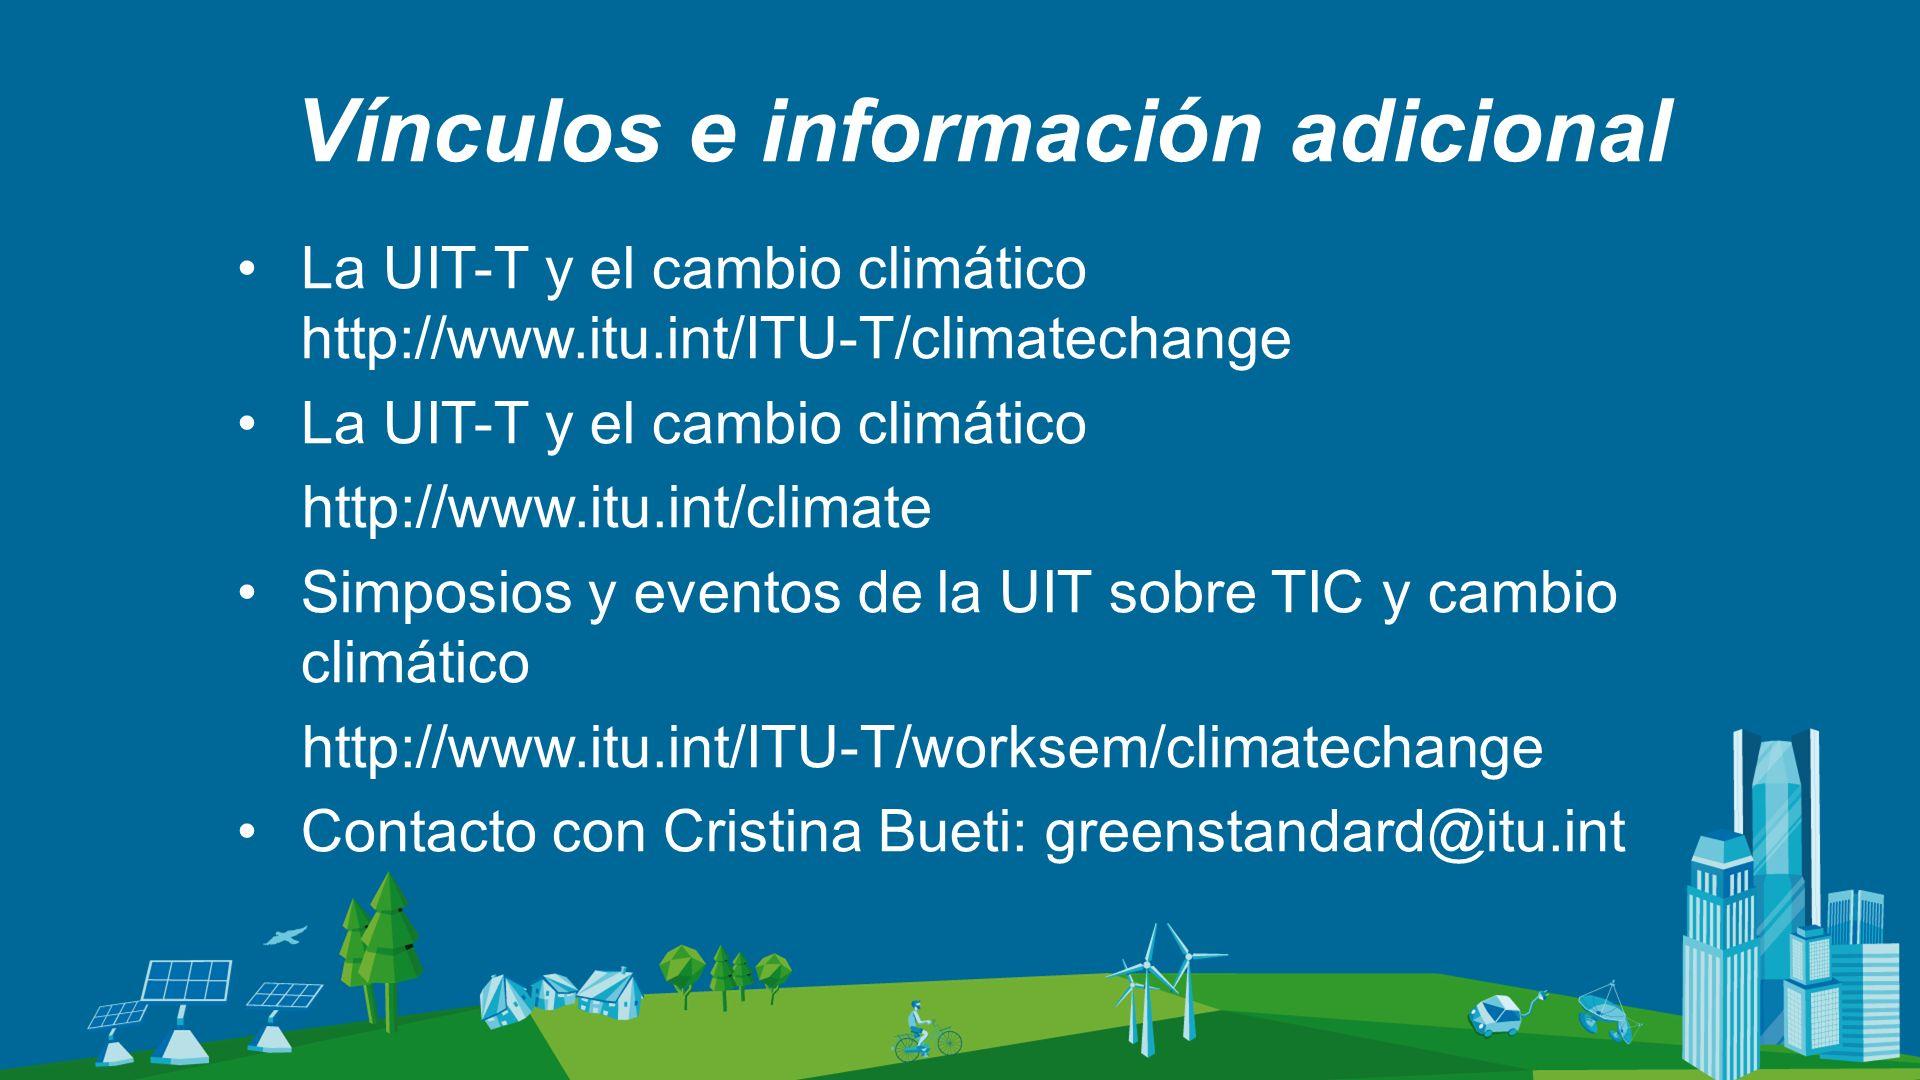 Vínculos e información adicional La UIT-T y el cambio climático http://www.itu.int/ITU-T/climatechange La UIT-T y el cambio climático http://www.itu.i